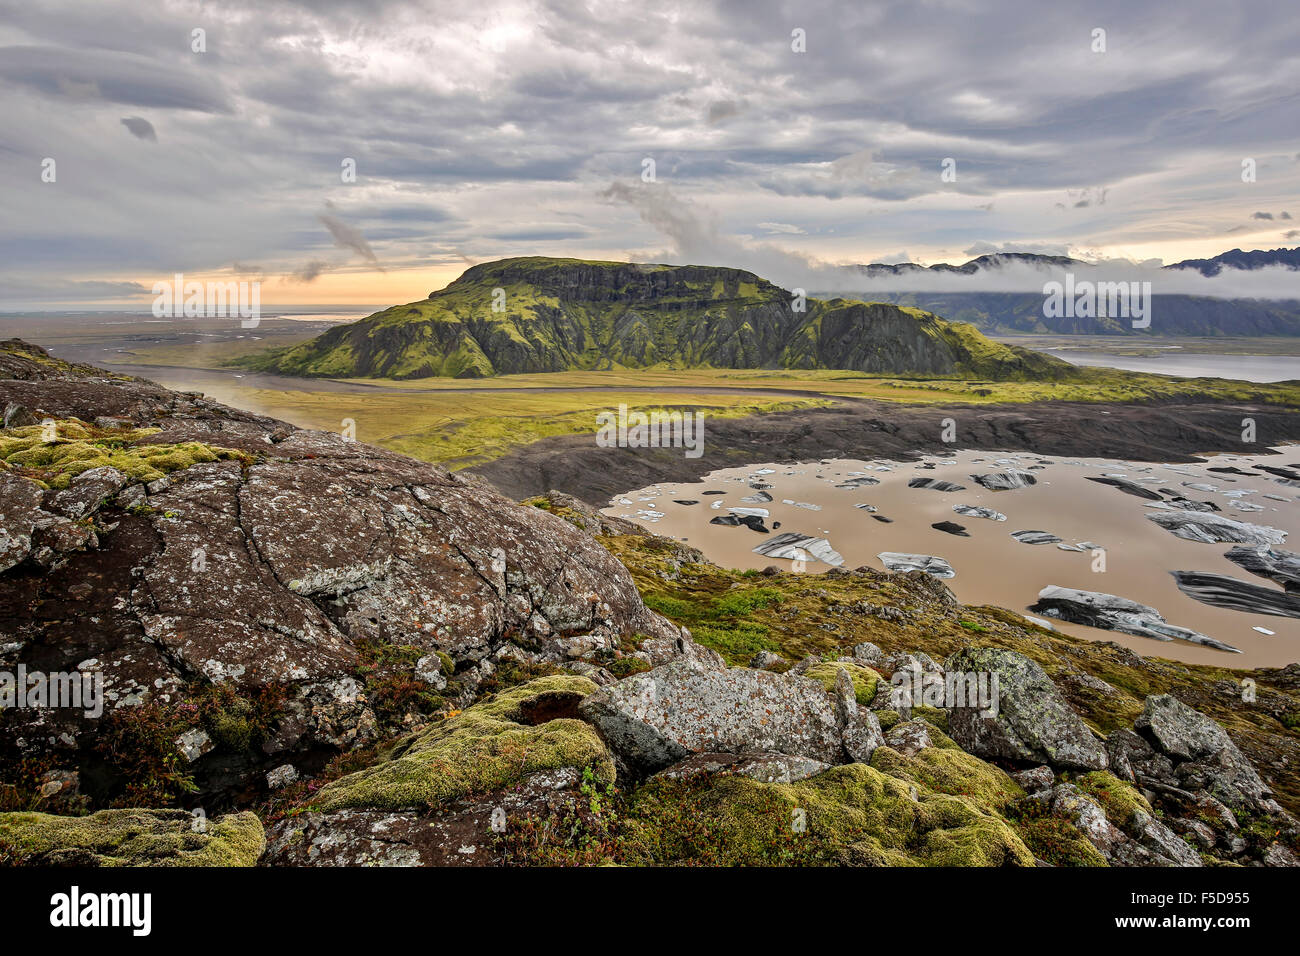 Svinafellsfjall mountain and icebergs on glacier lagoon, terminus of Hoffellsjokul Glacier, Iceland - Stock Image